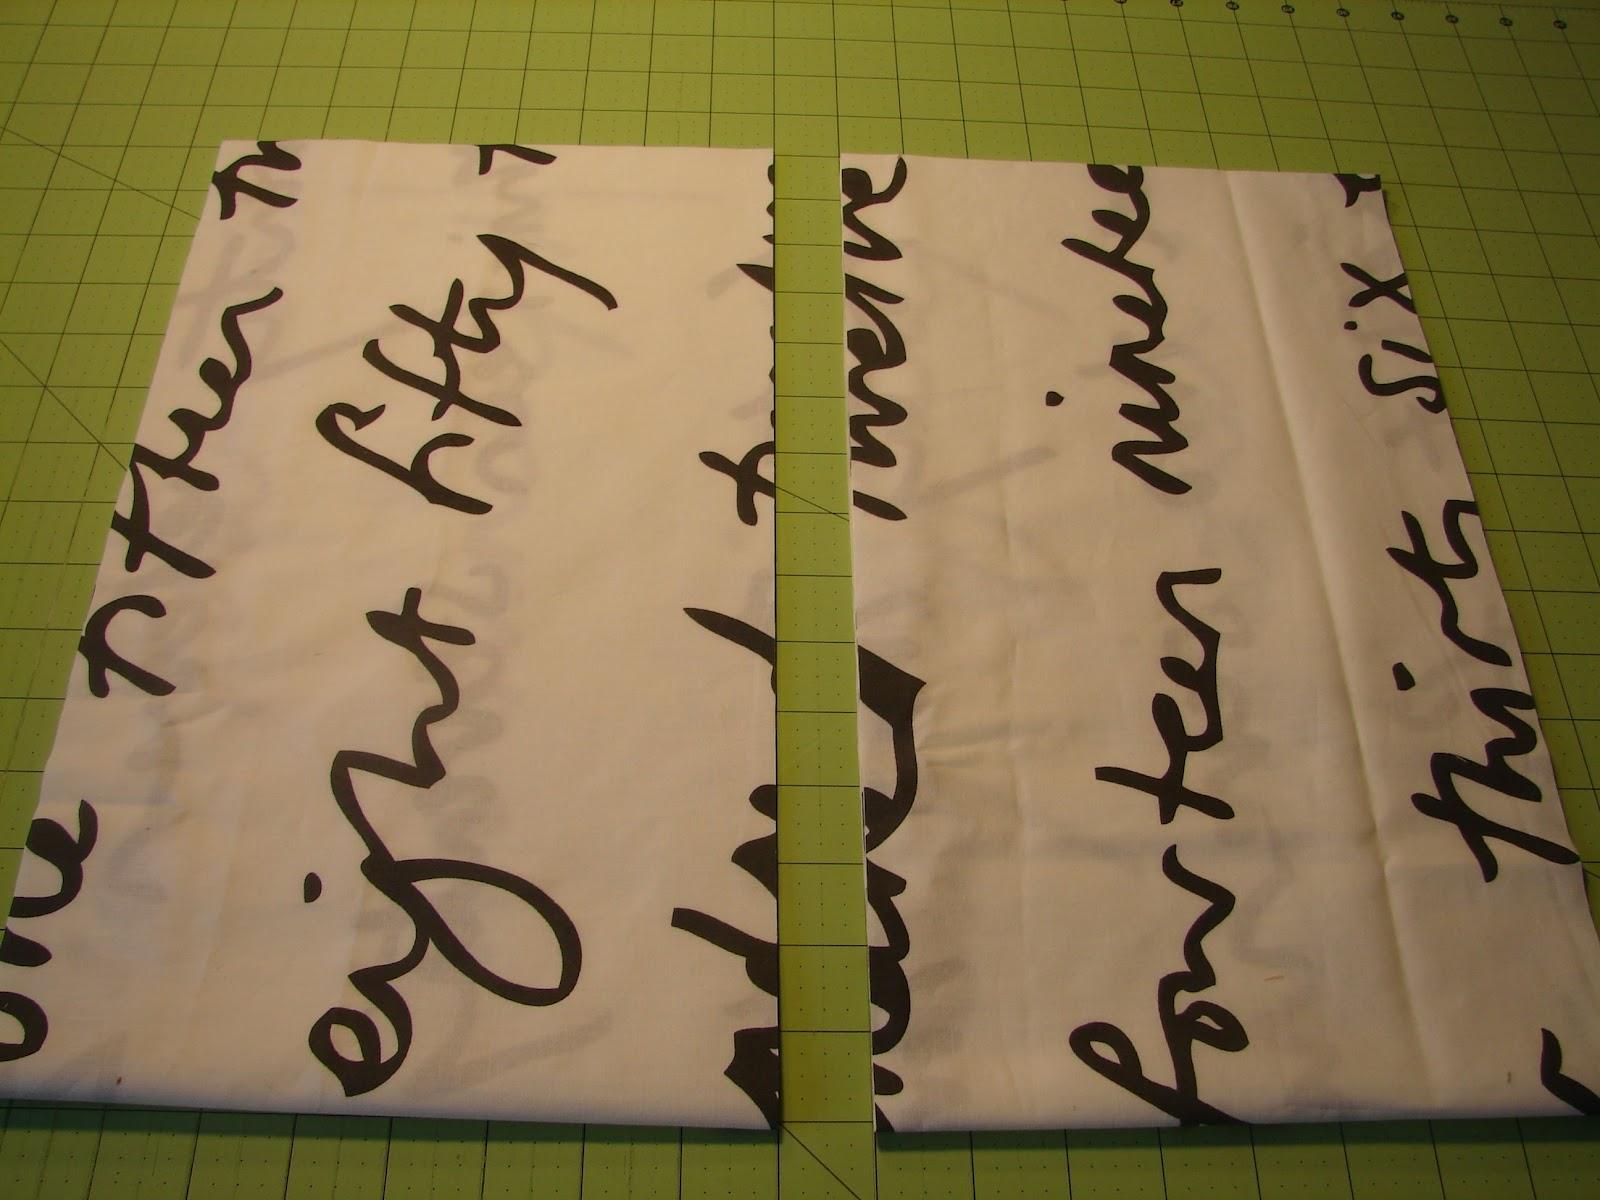 tallgrass prairie studio: Hang Your Quilt! (Hanging Sleeve Tutorial) : quilt hanging sleeve - Adamdwight.com